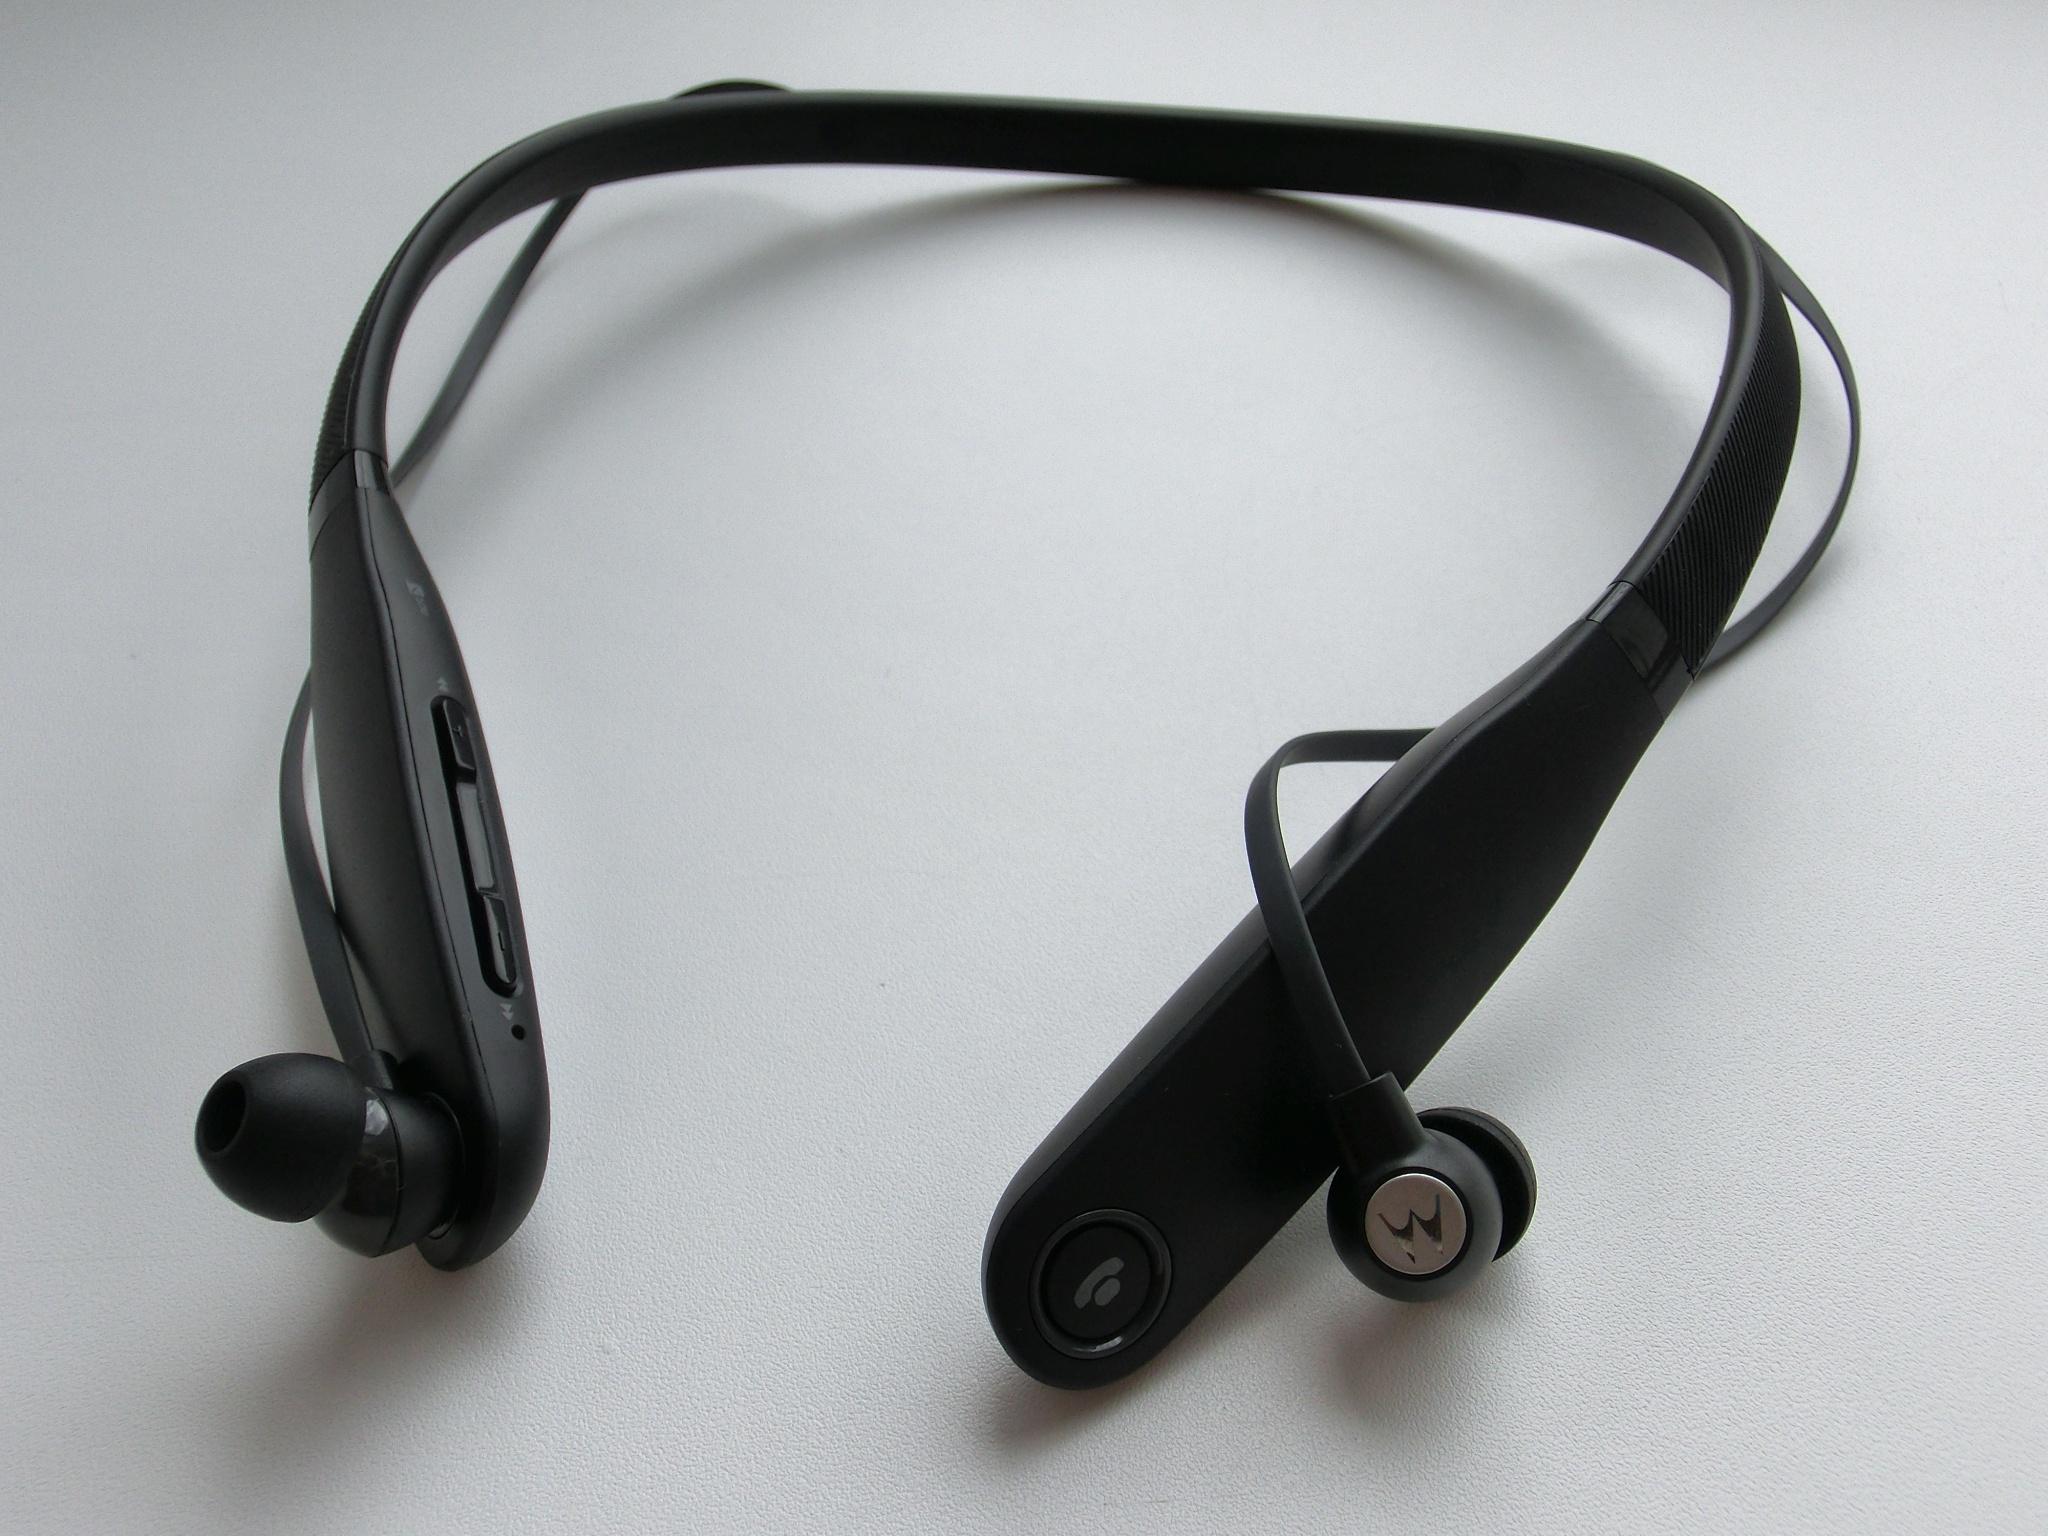 Обзор на Bluetooth-гарнитура MOTOROLA VERVE RIDER Black - изображение 1 fc74789ae6864